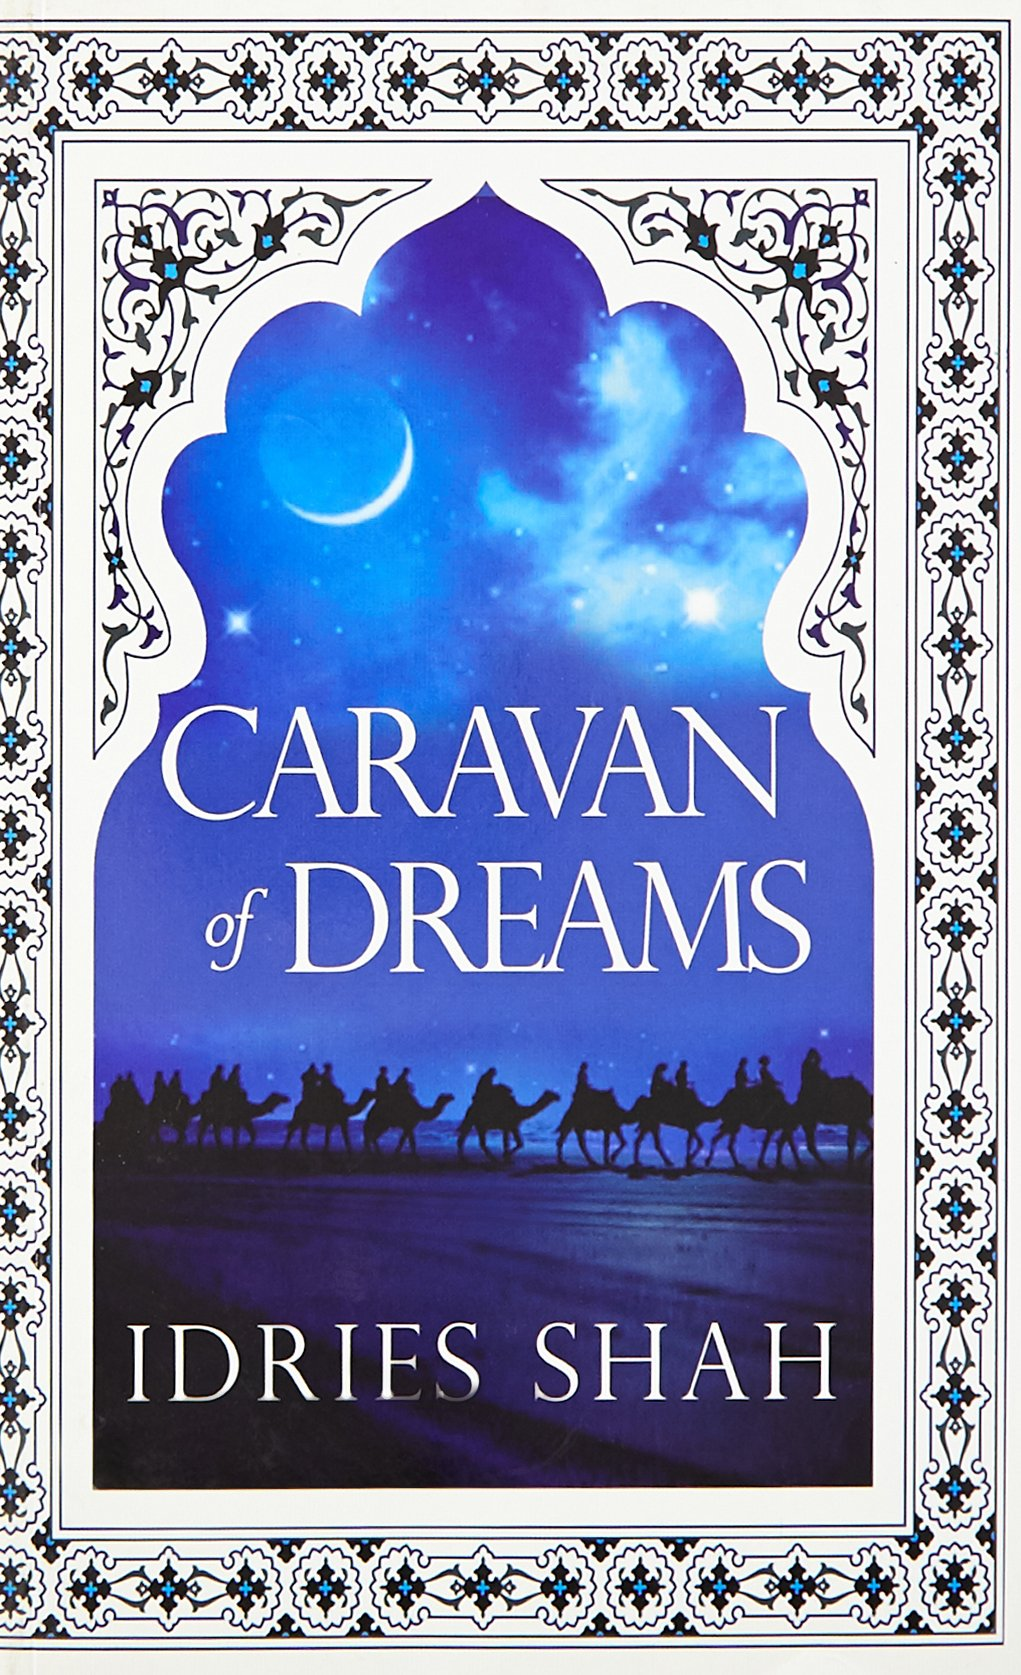 Buy Caravan of Dreams Book Online at Low Prices in India | Caravan of  Dreams Reviews & Ratings - Amazon.in